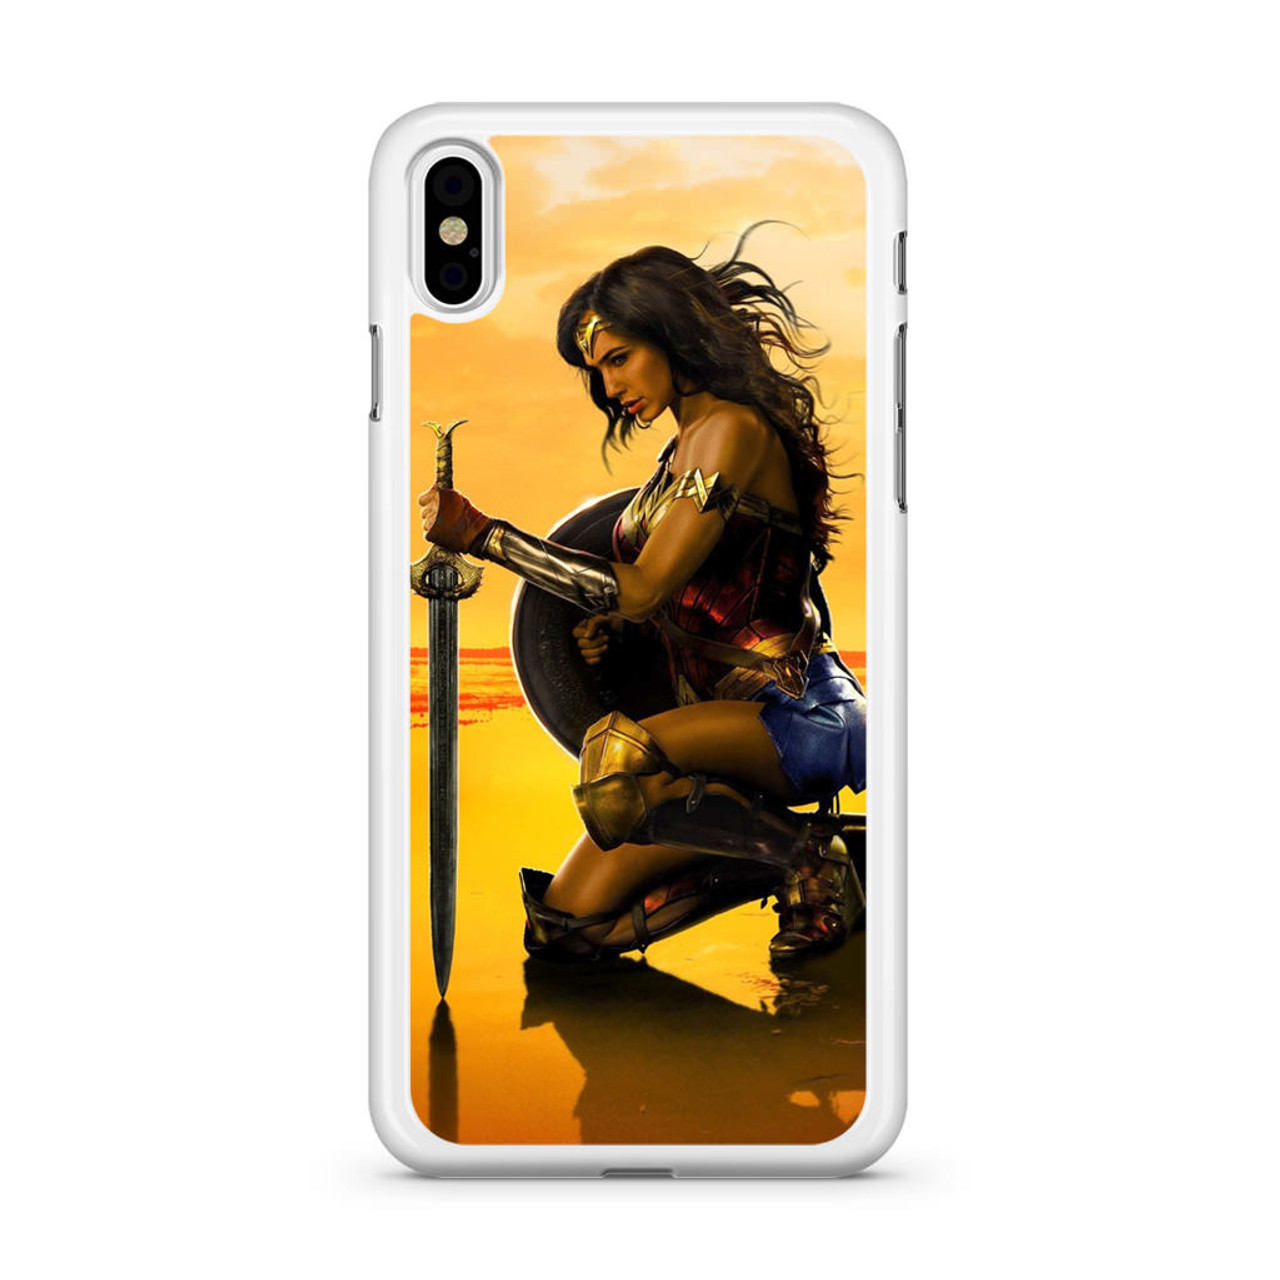 WONDER WOMAN Gal Gadot Poster iphone case